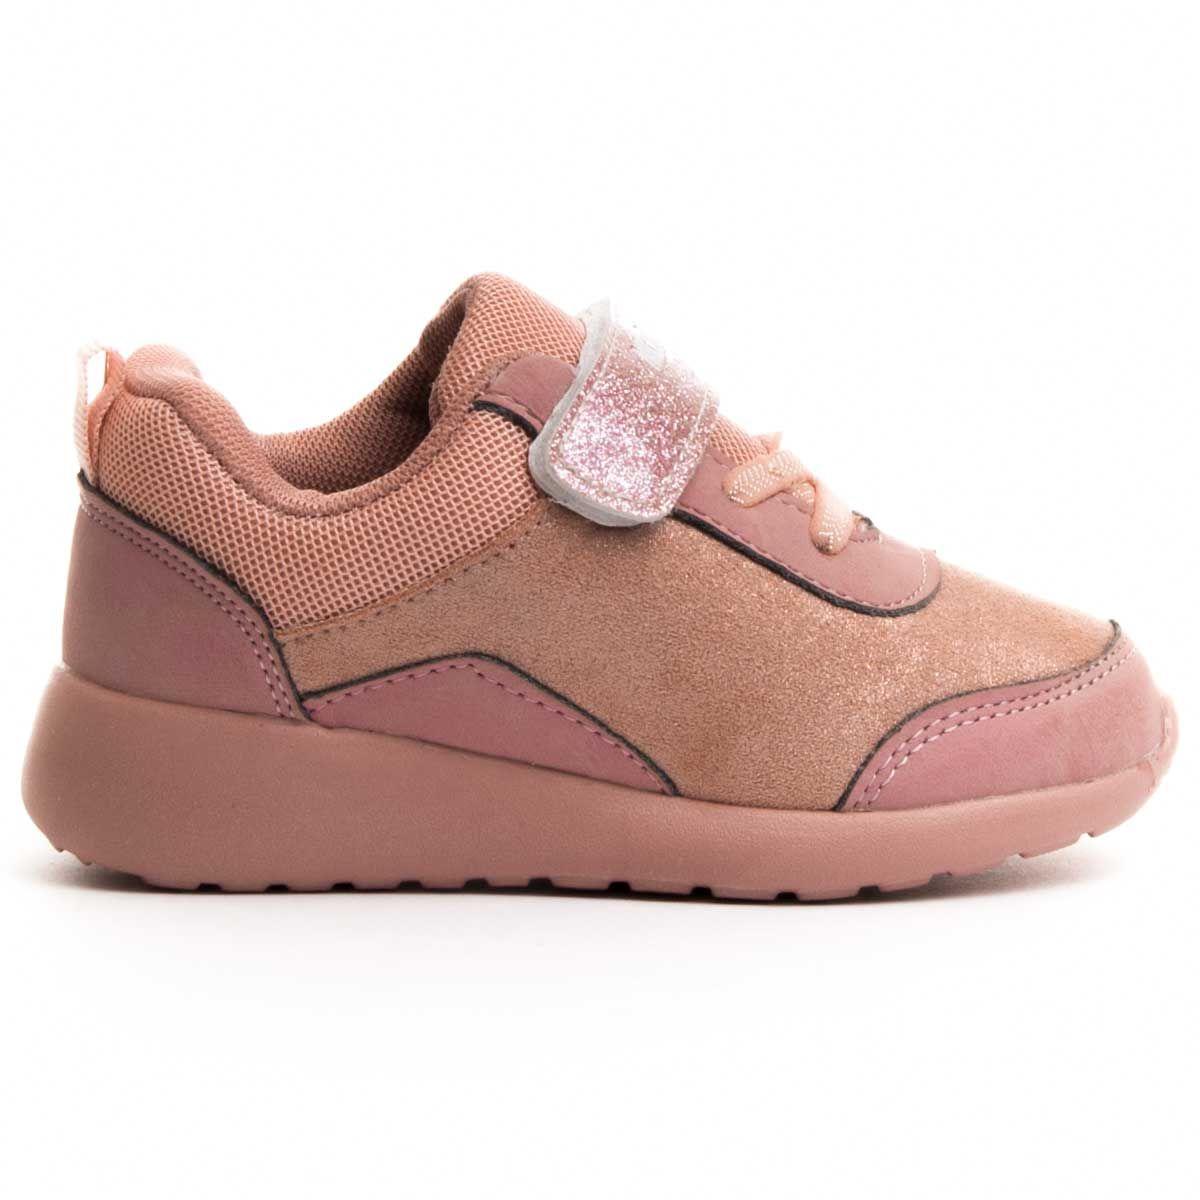 Montevita Velcro Sneaker in Pink